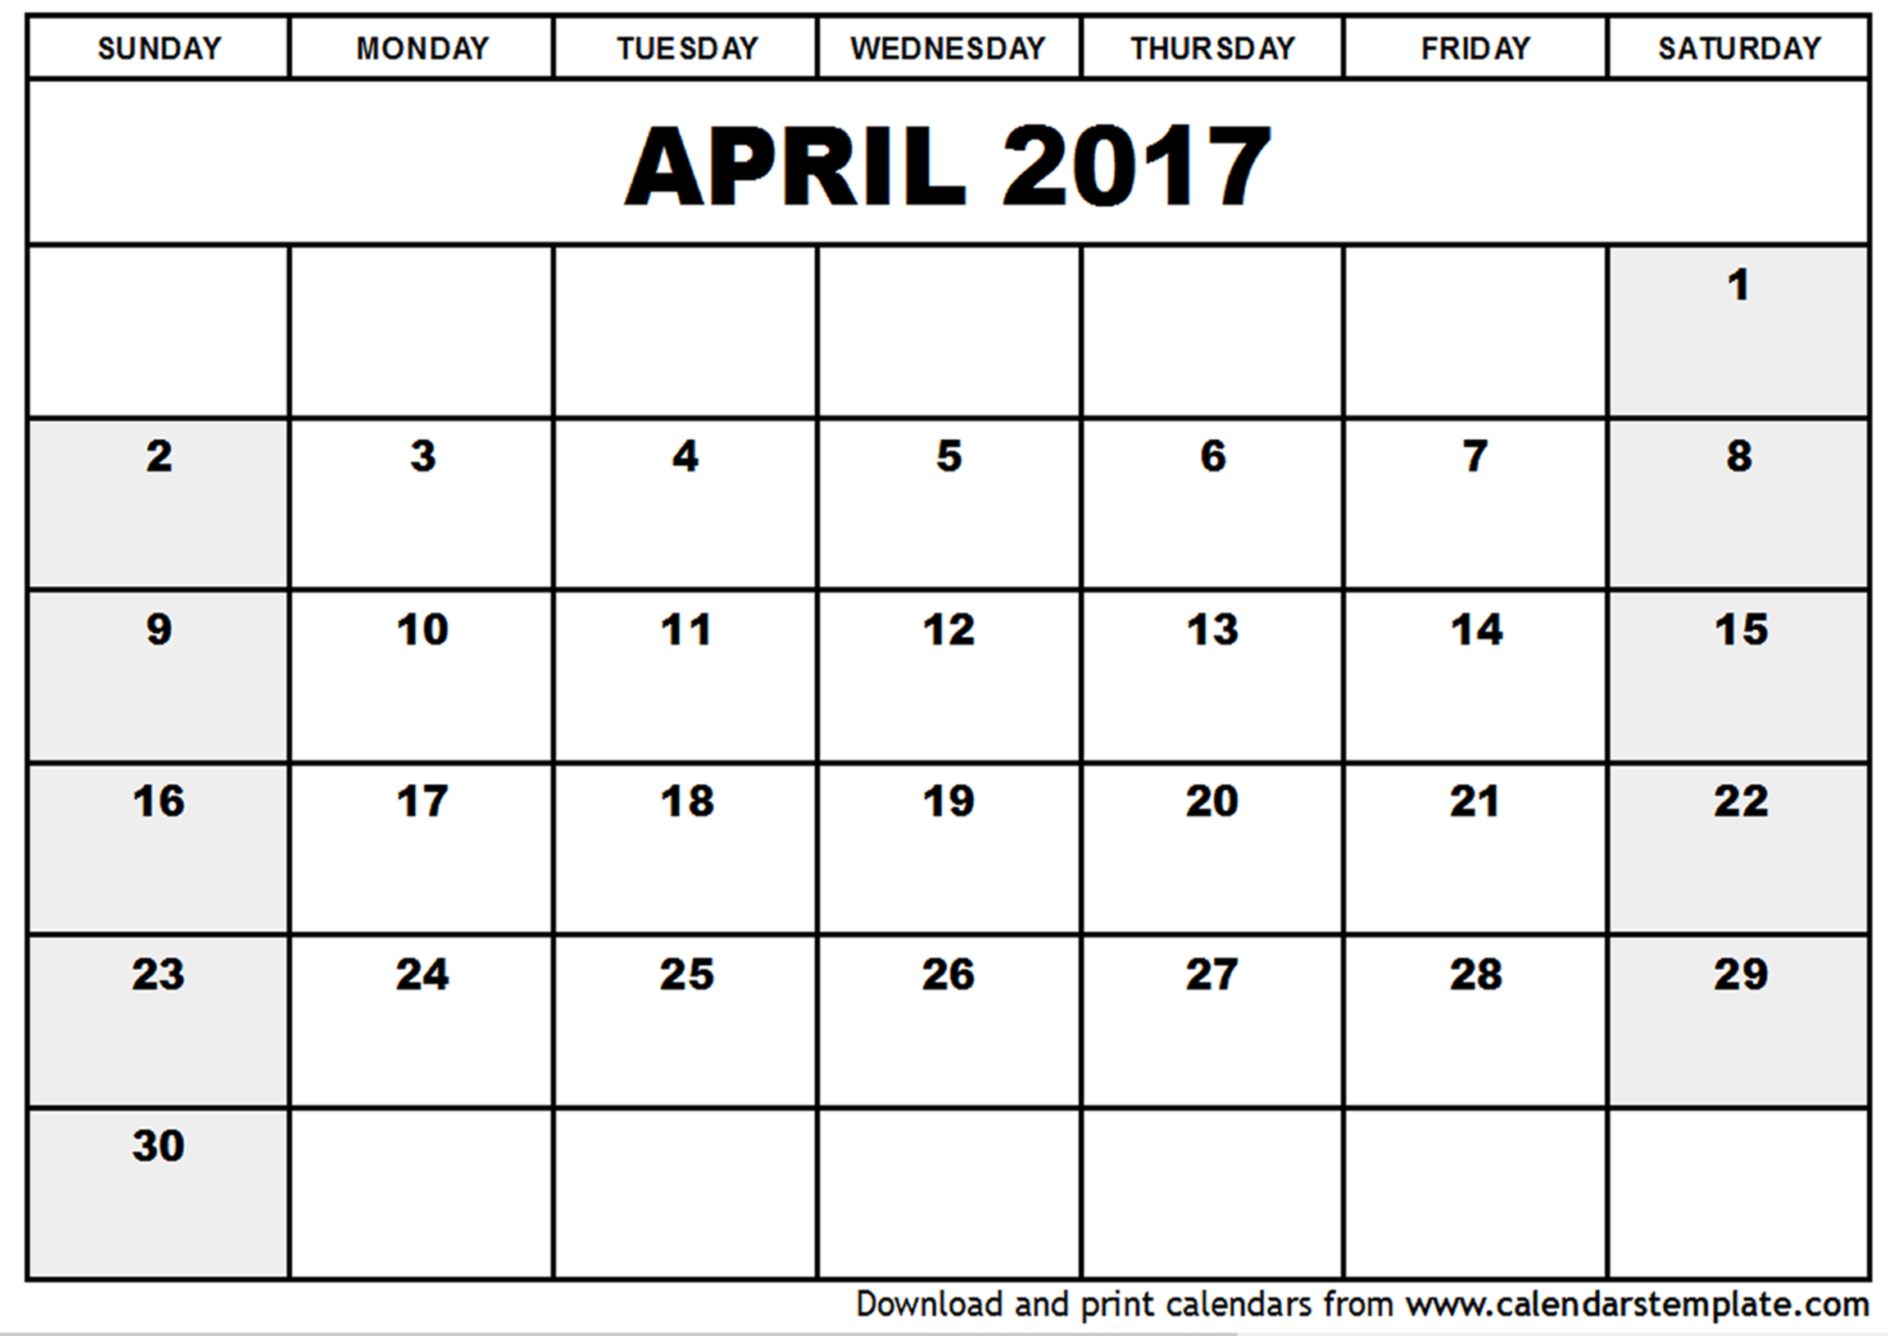 april 2017 printable calendar free